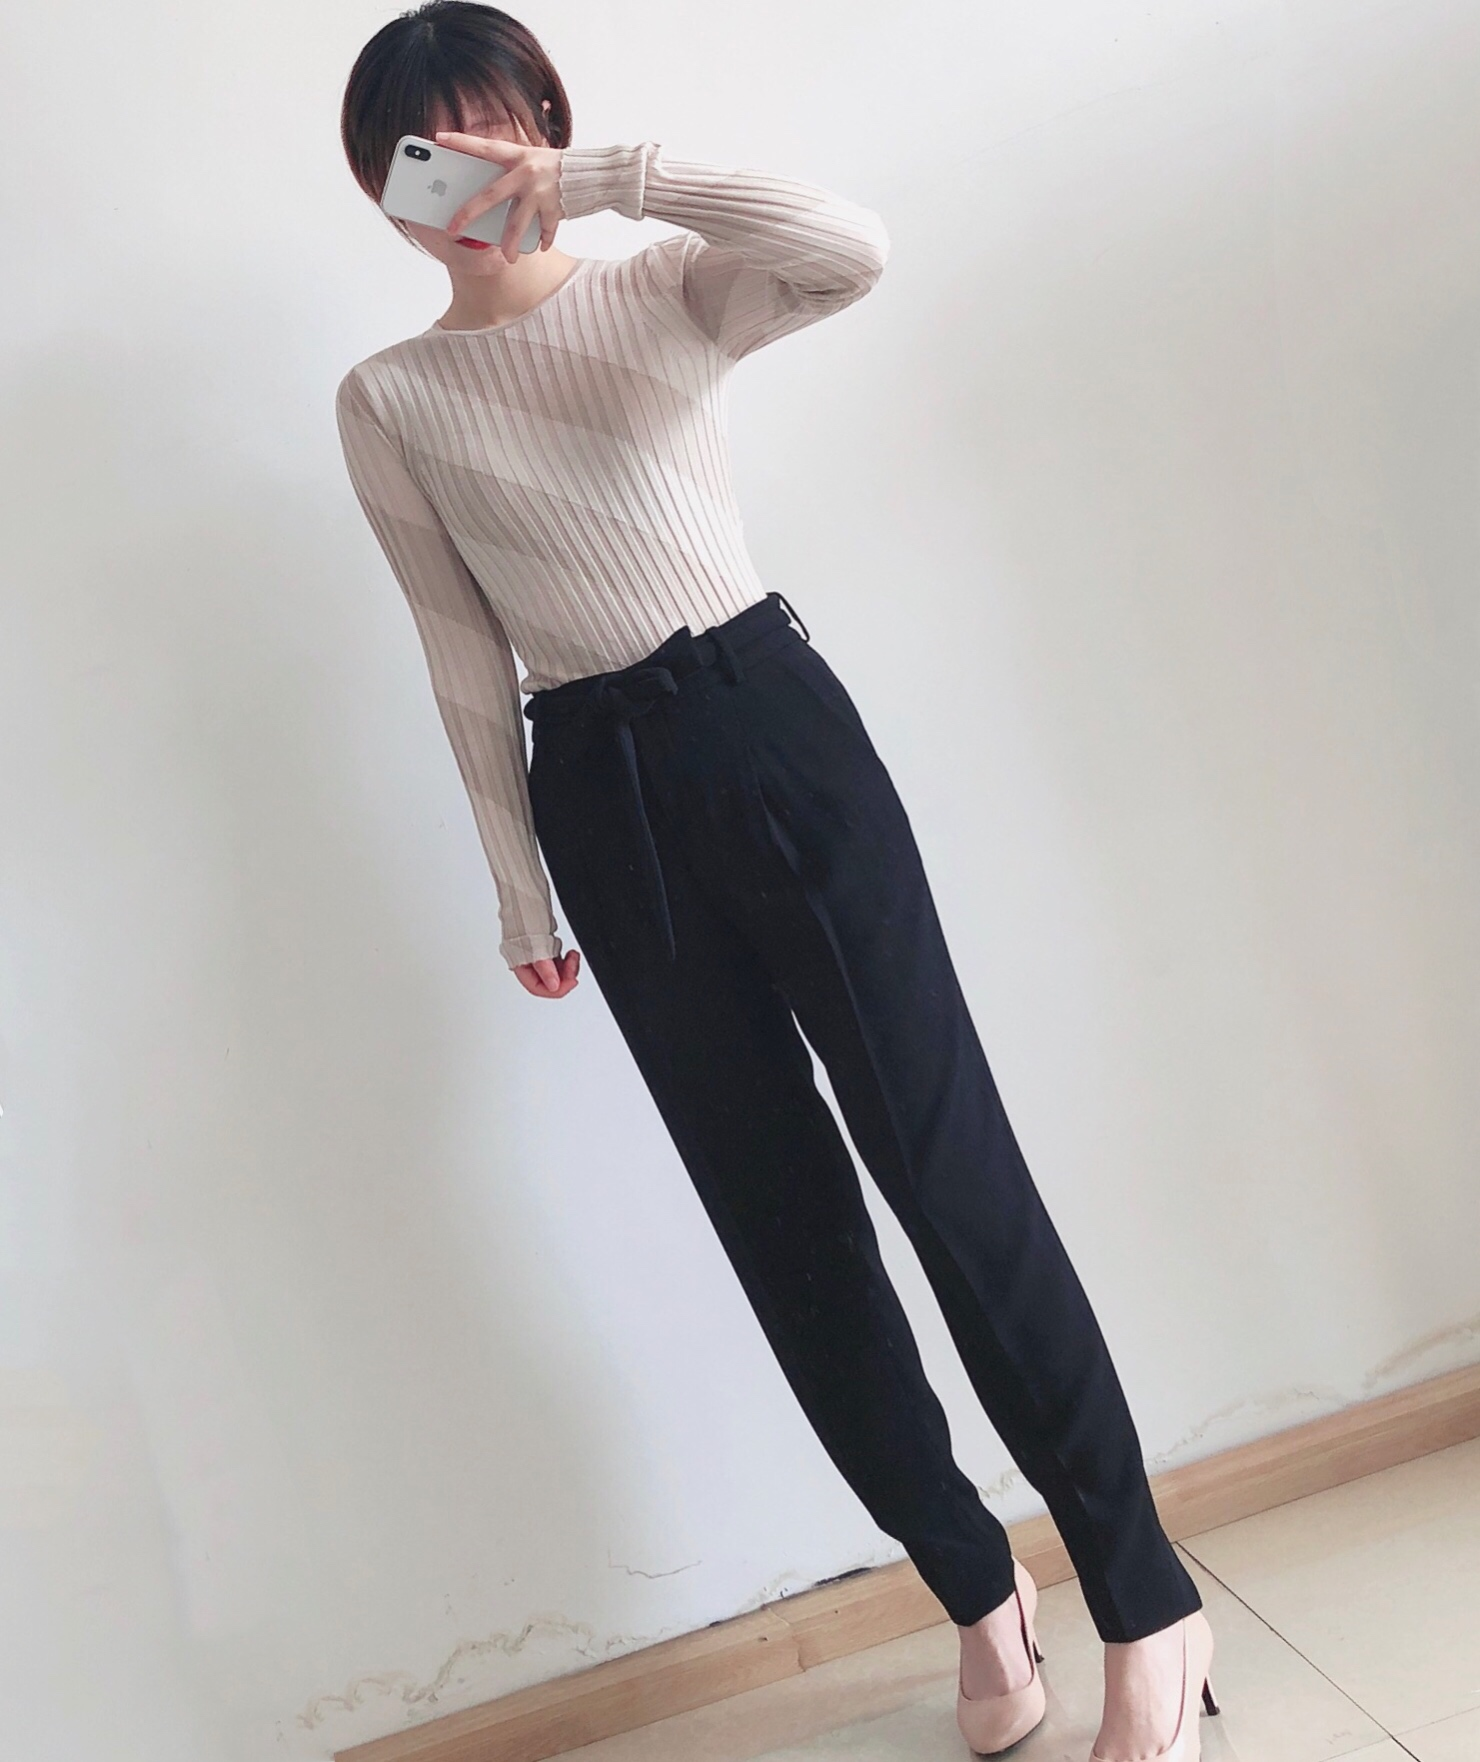 Theory 希尔瑞 桑蚕丝坑条纹 女式针织衫 J1212702 M码2.5折$75.25 海淘转运到手约¥551 天猫¥1920